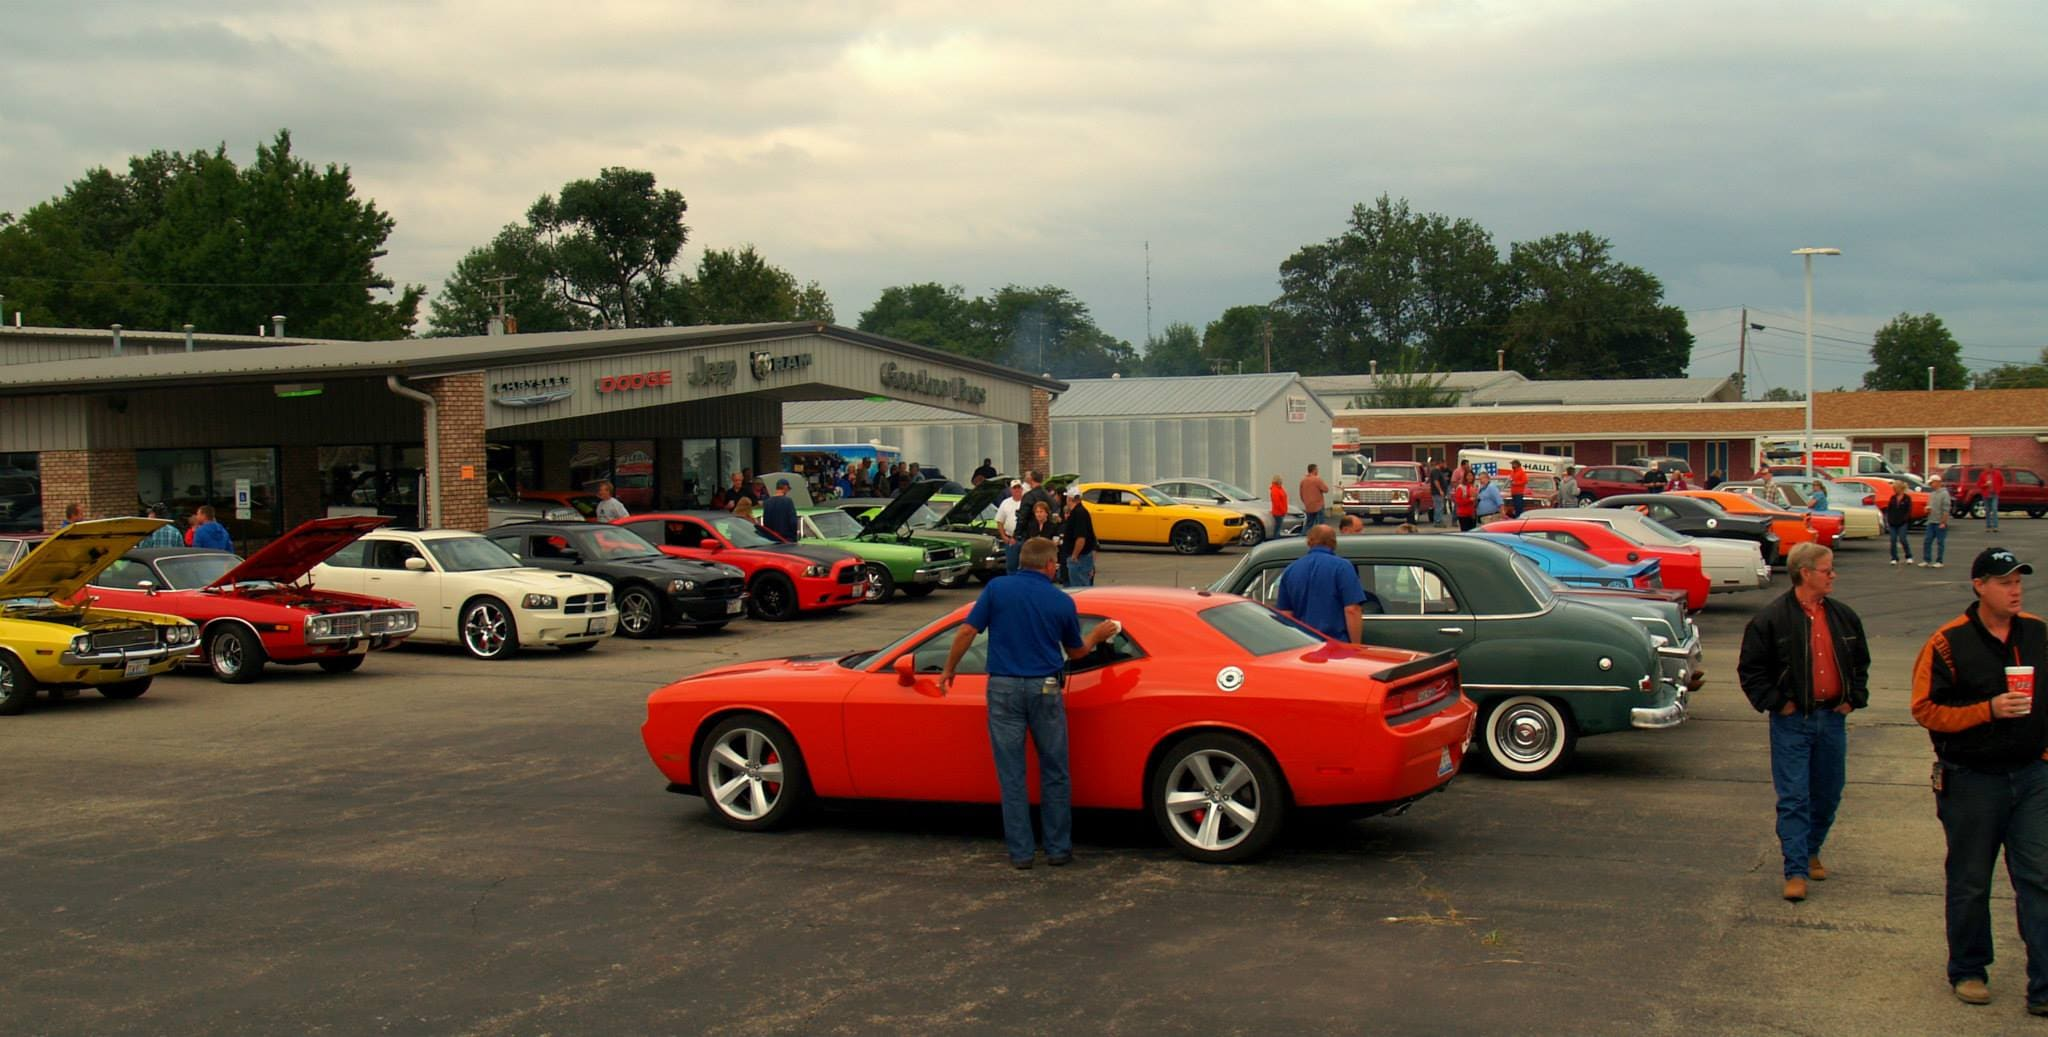 Goeckner Bros., Inc. | New Chrysler, Dodge, Jeep, Ram dealership in ...